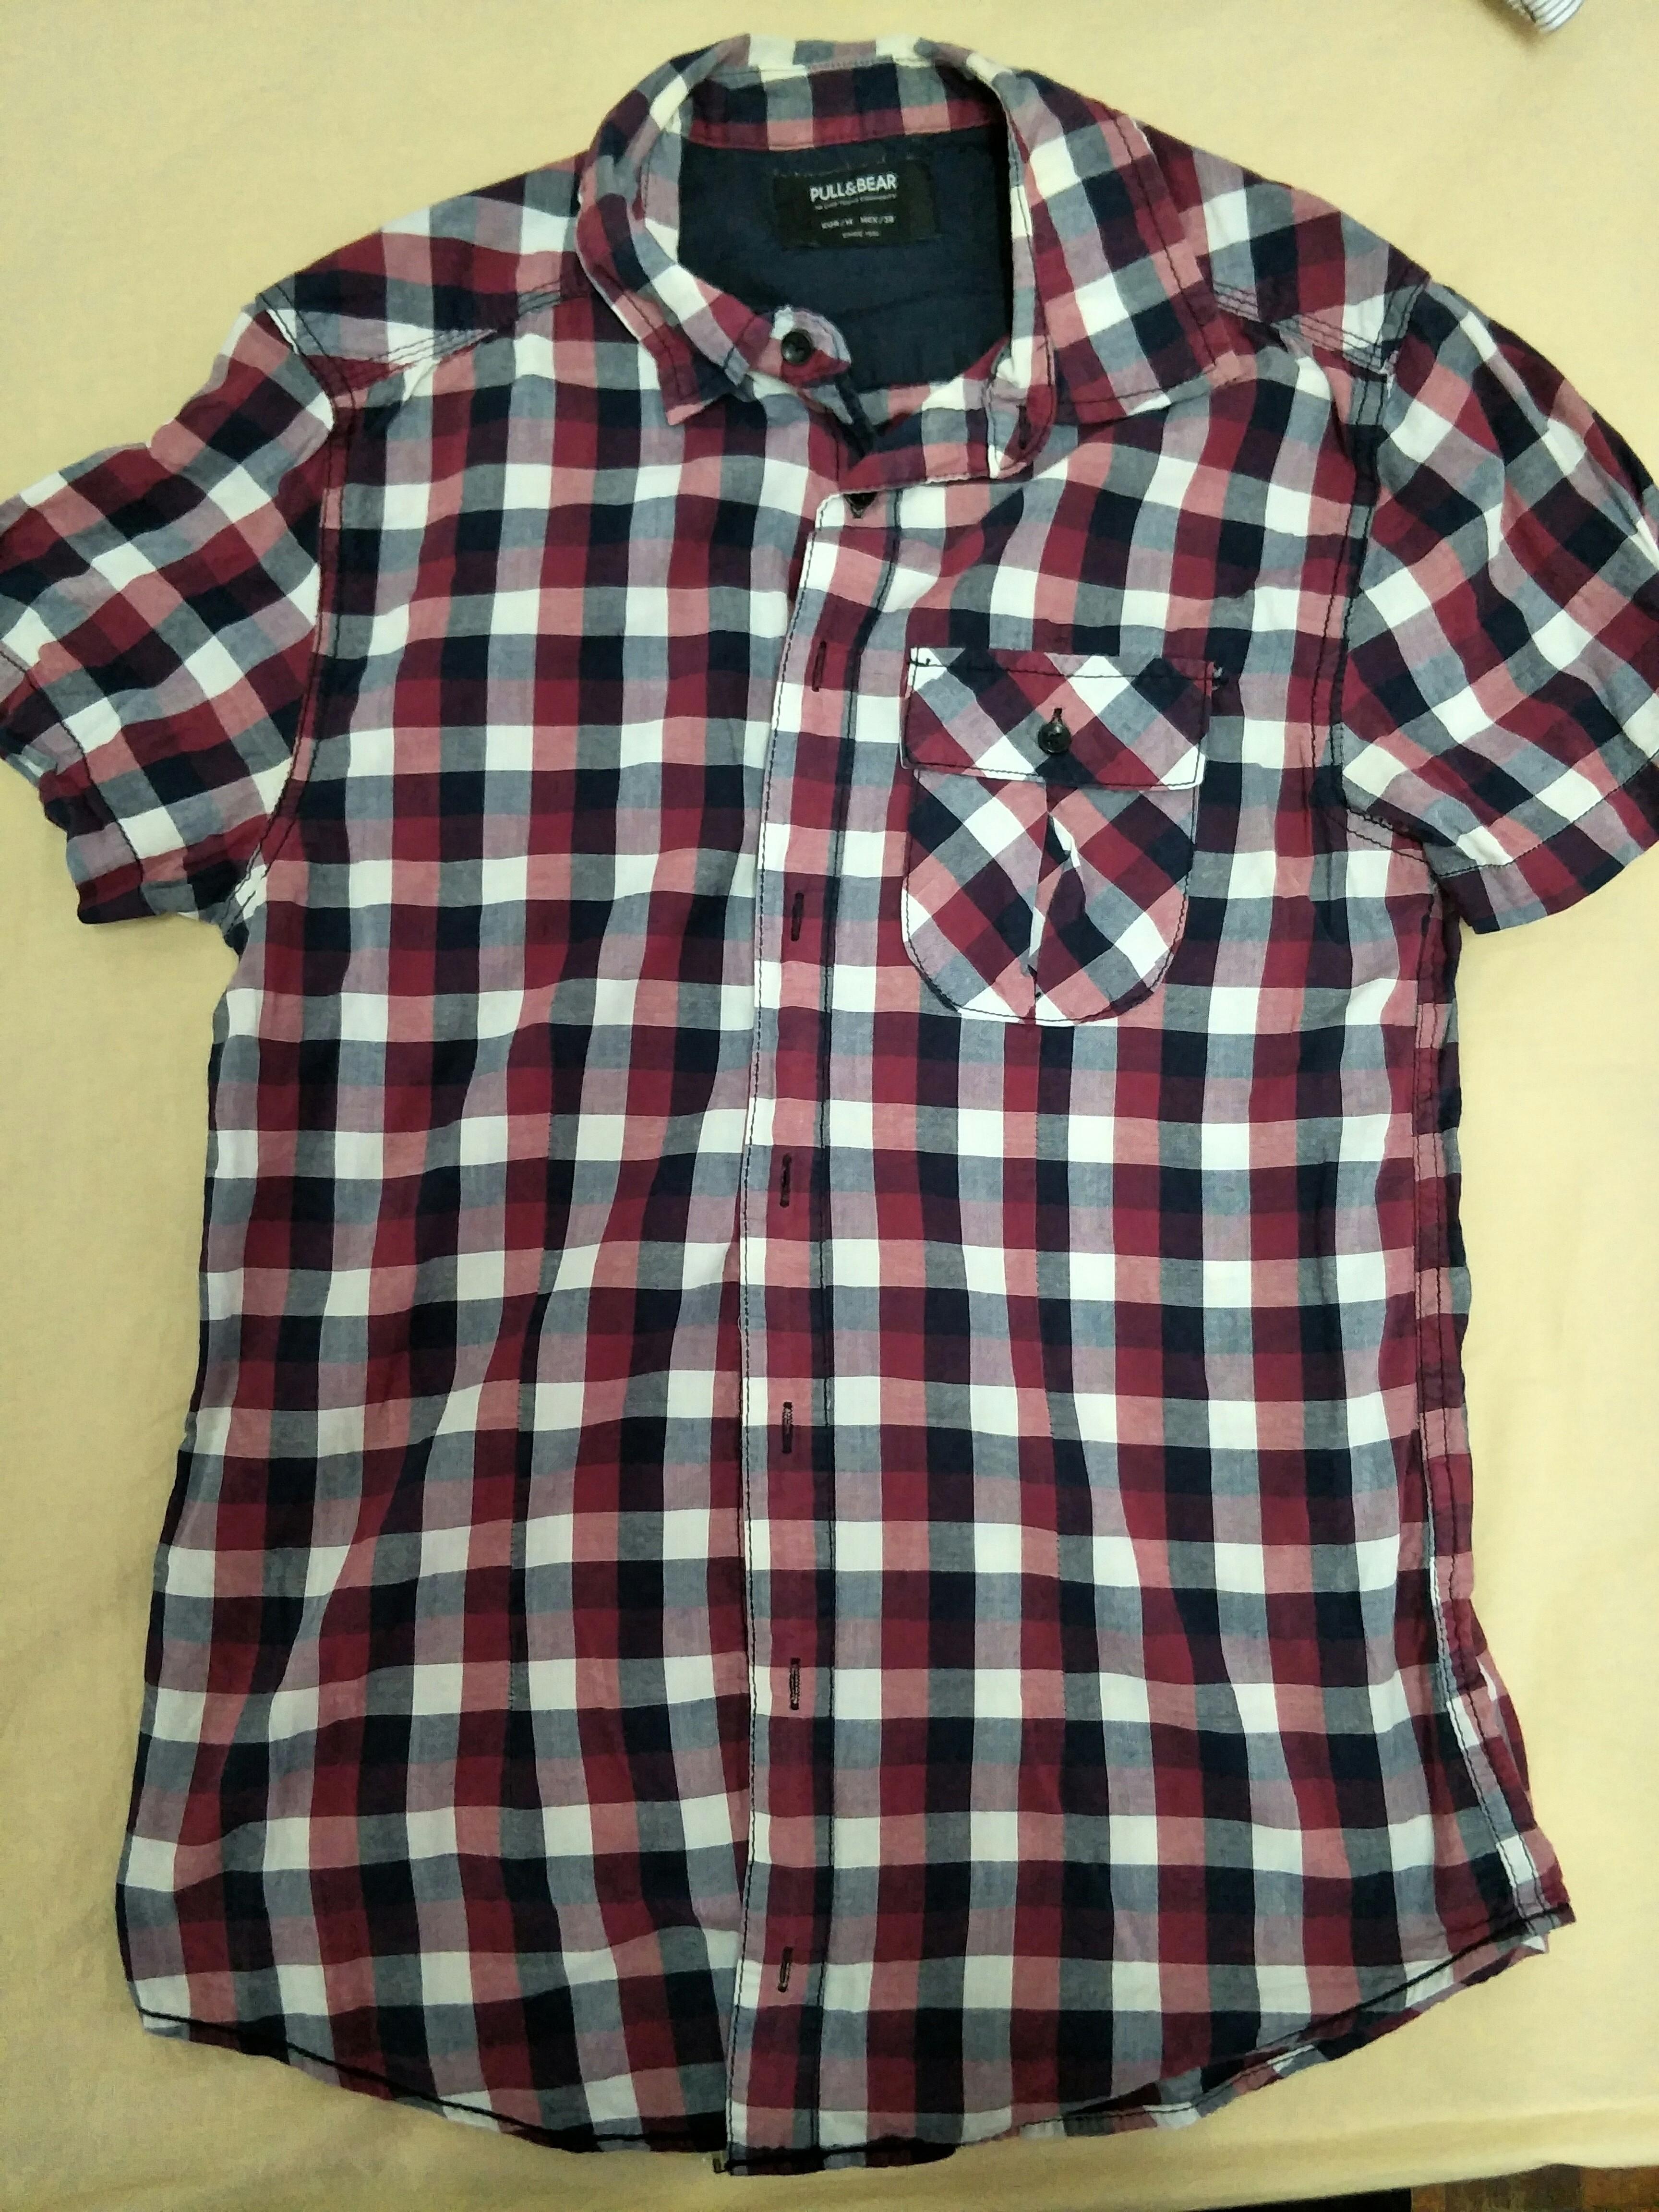 Pull & bear Checkered shirt size s